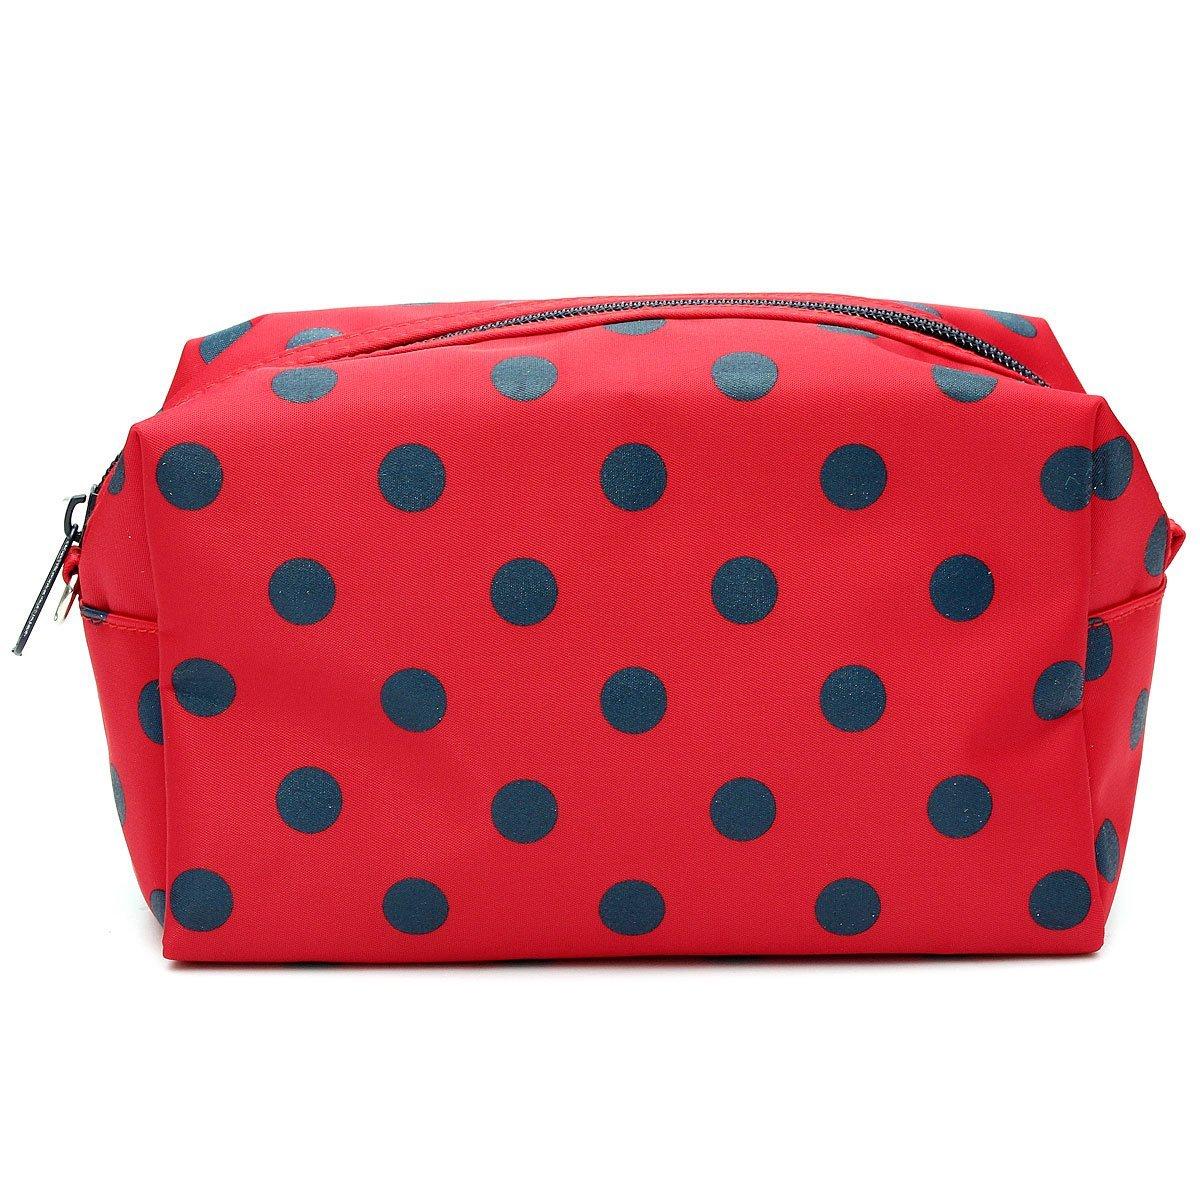 SODIAL(R) rosso cosmetico / Trucco / Organizer Hand Case Zipper TOOGOO(R)